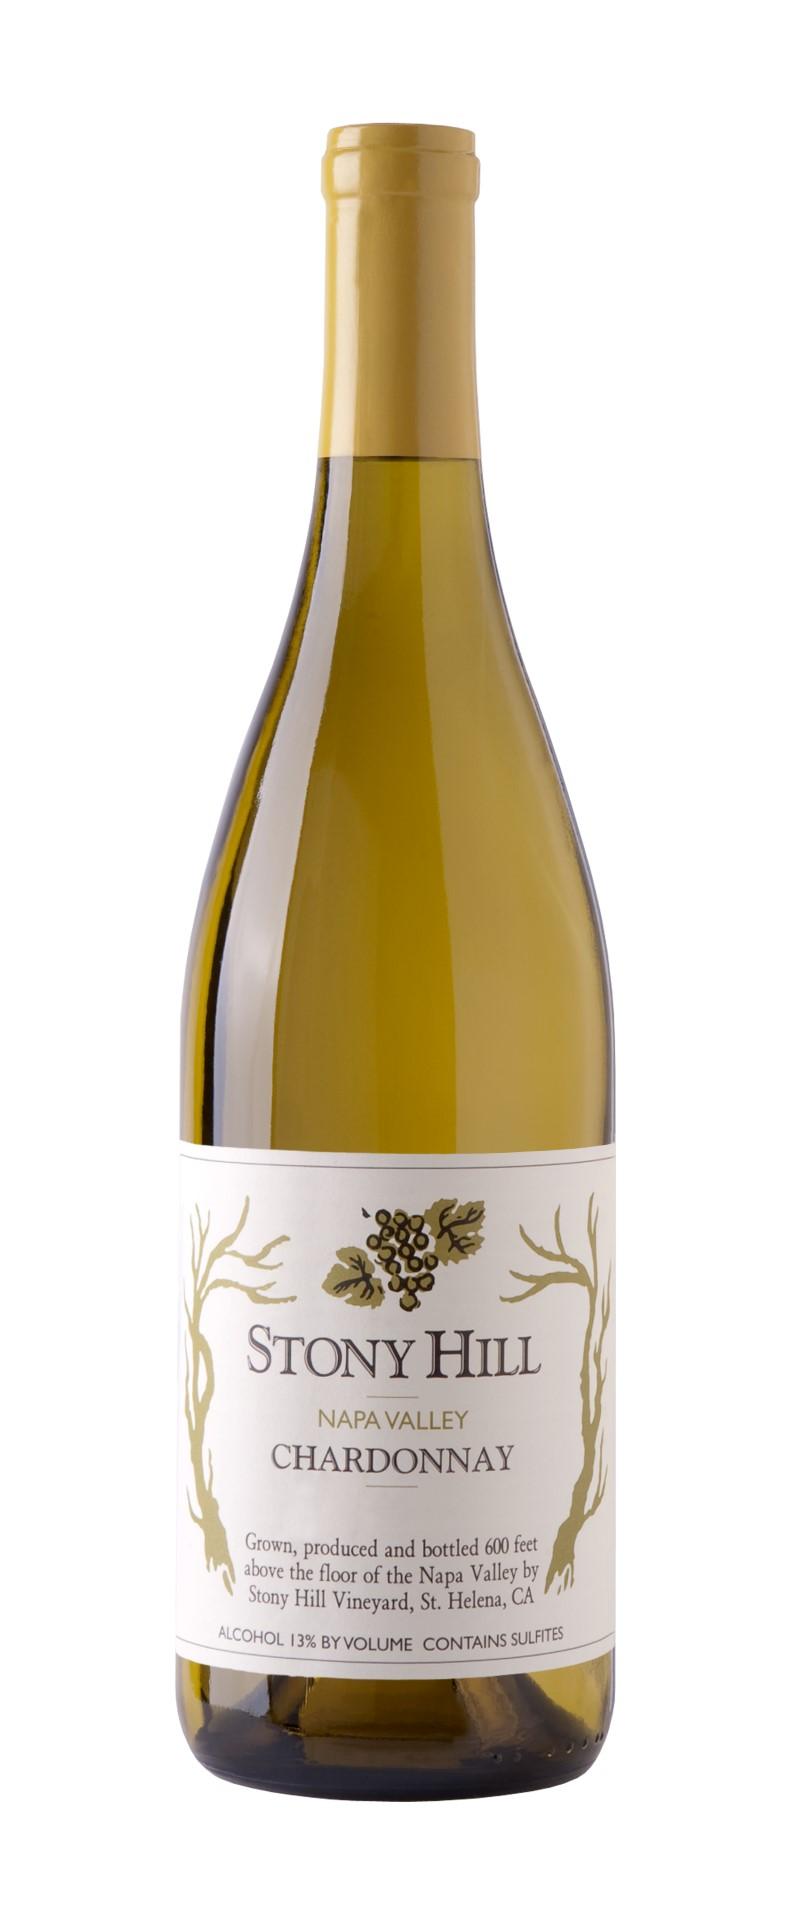 2015 Stony Hill Chardonnay Spring Mountain District